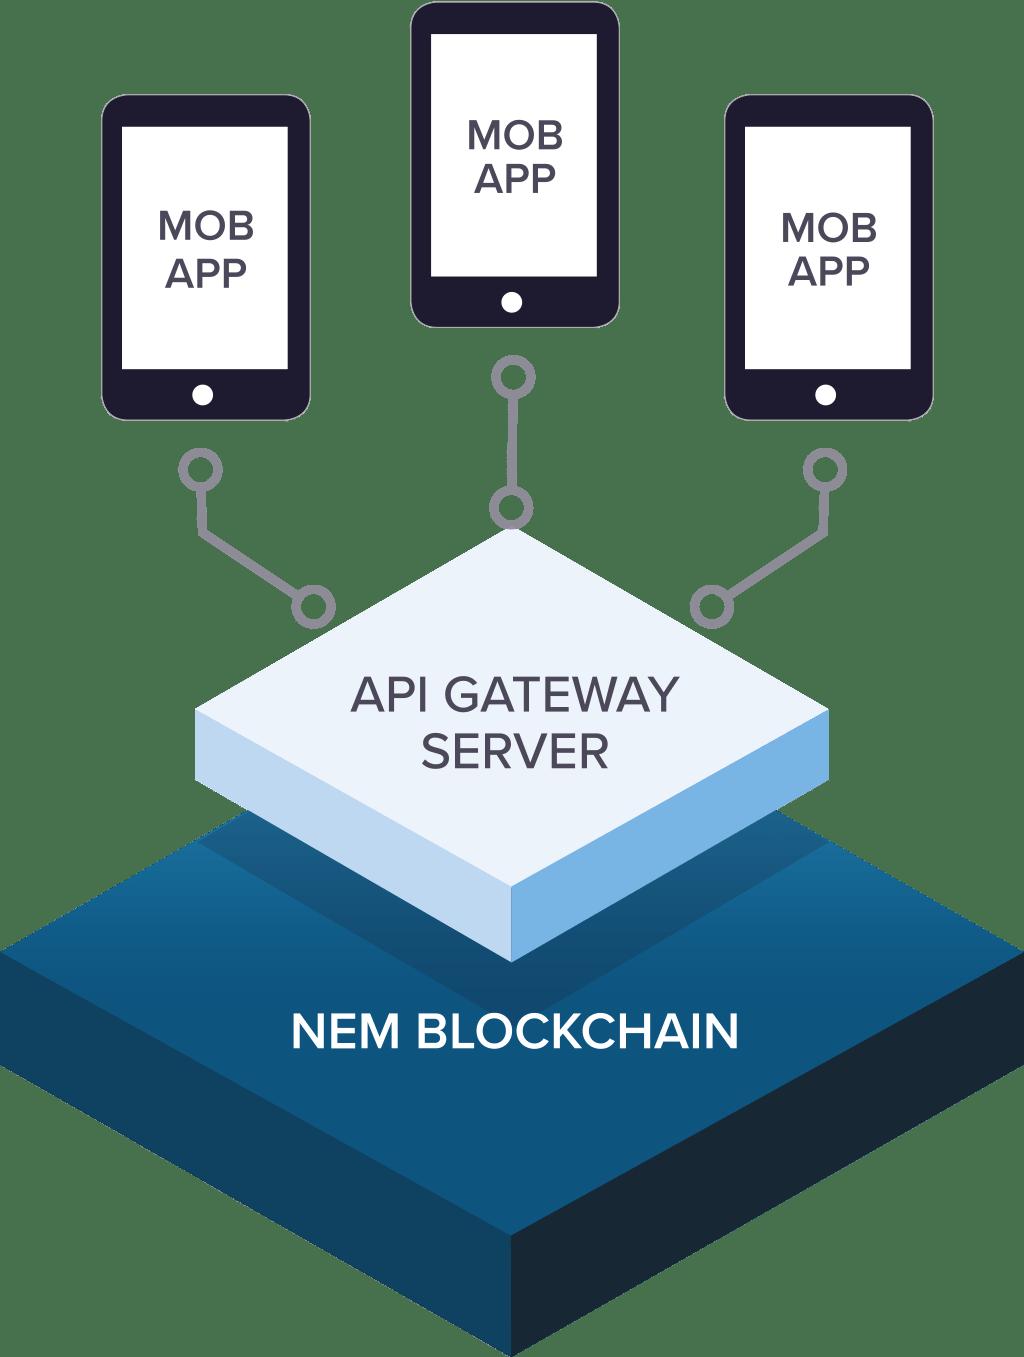 Ecosistema NEM Blockchain